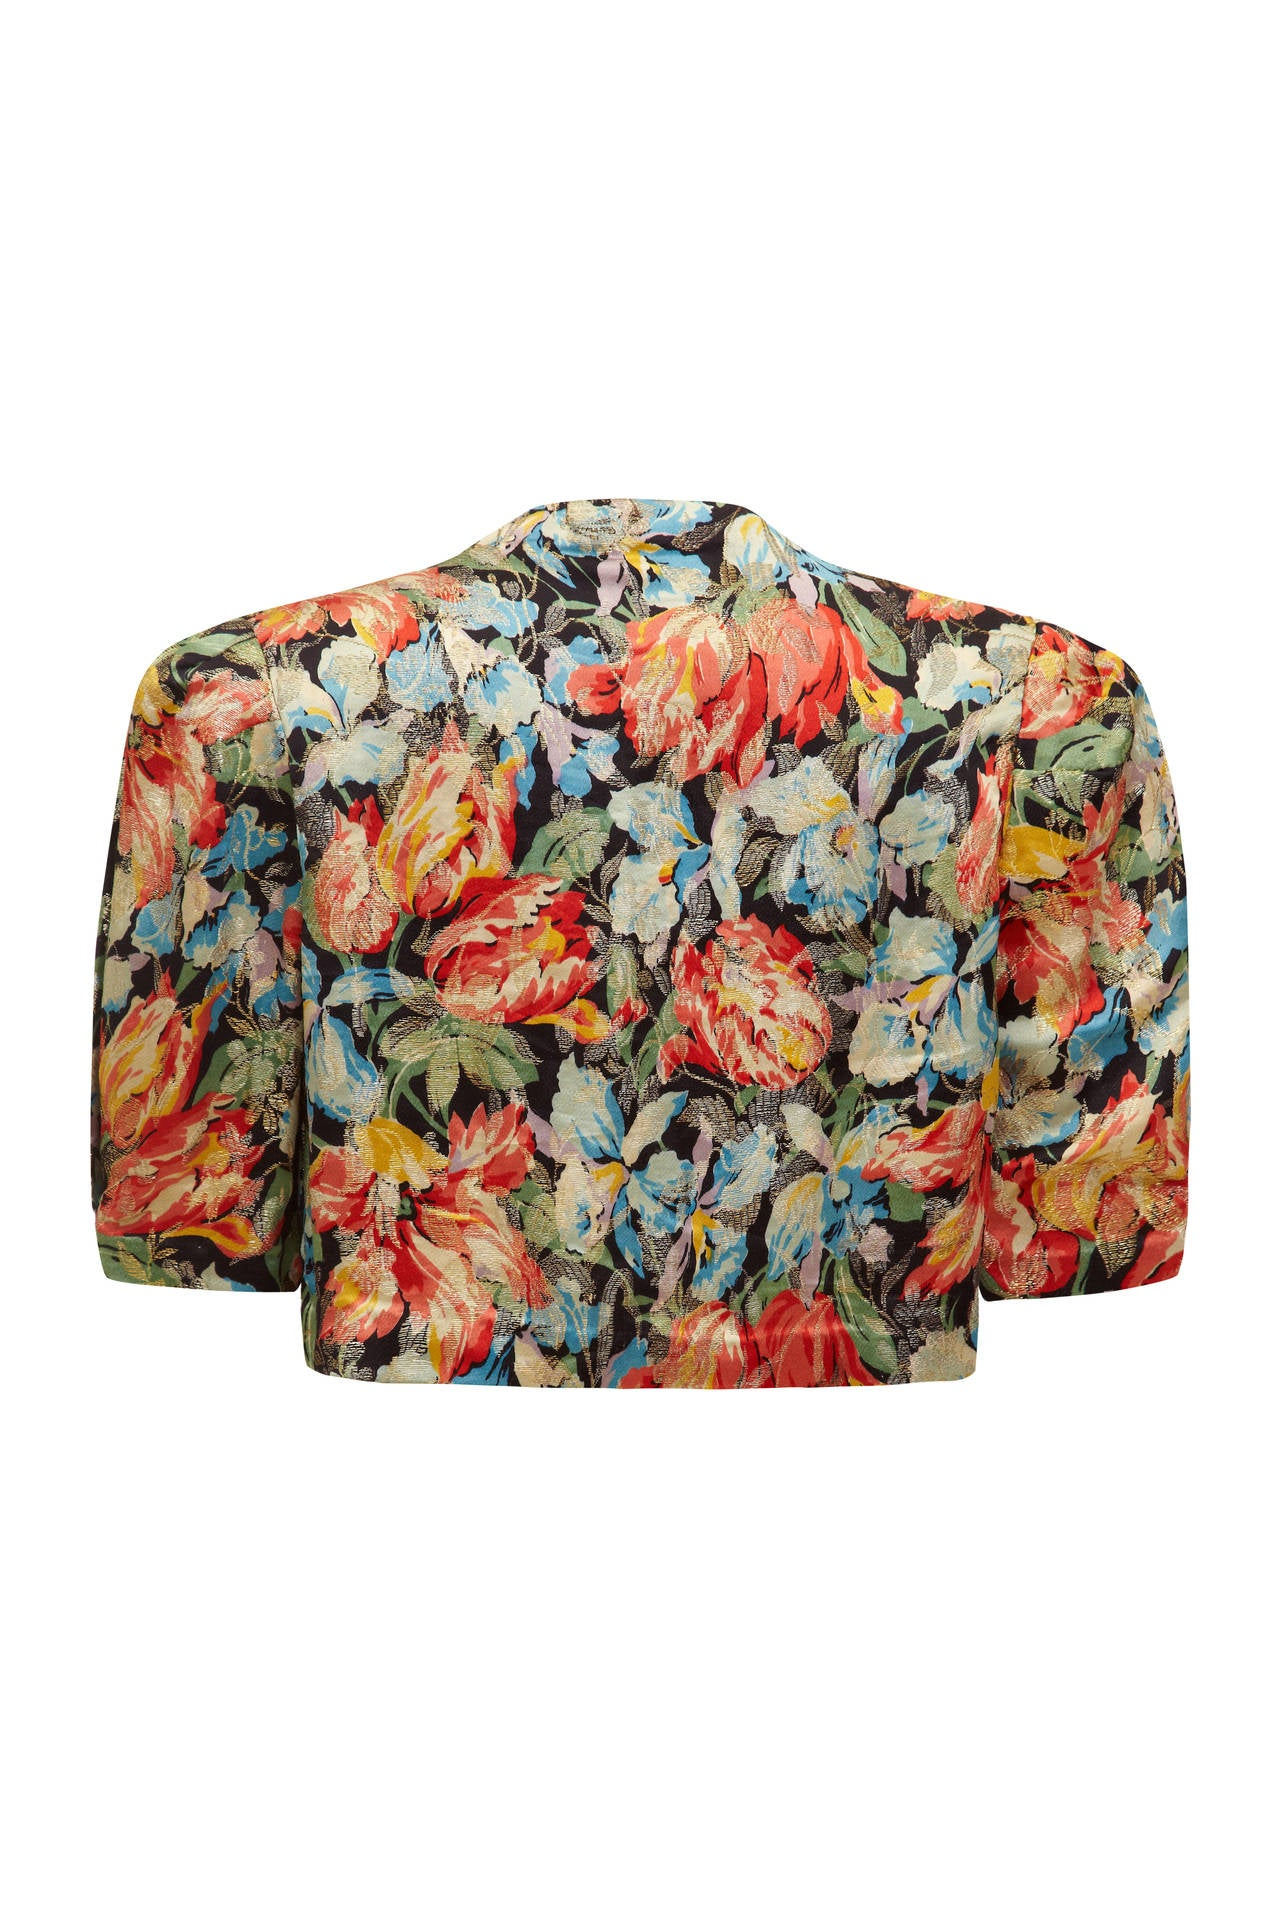 1930s Floral Lame Jacket 2